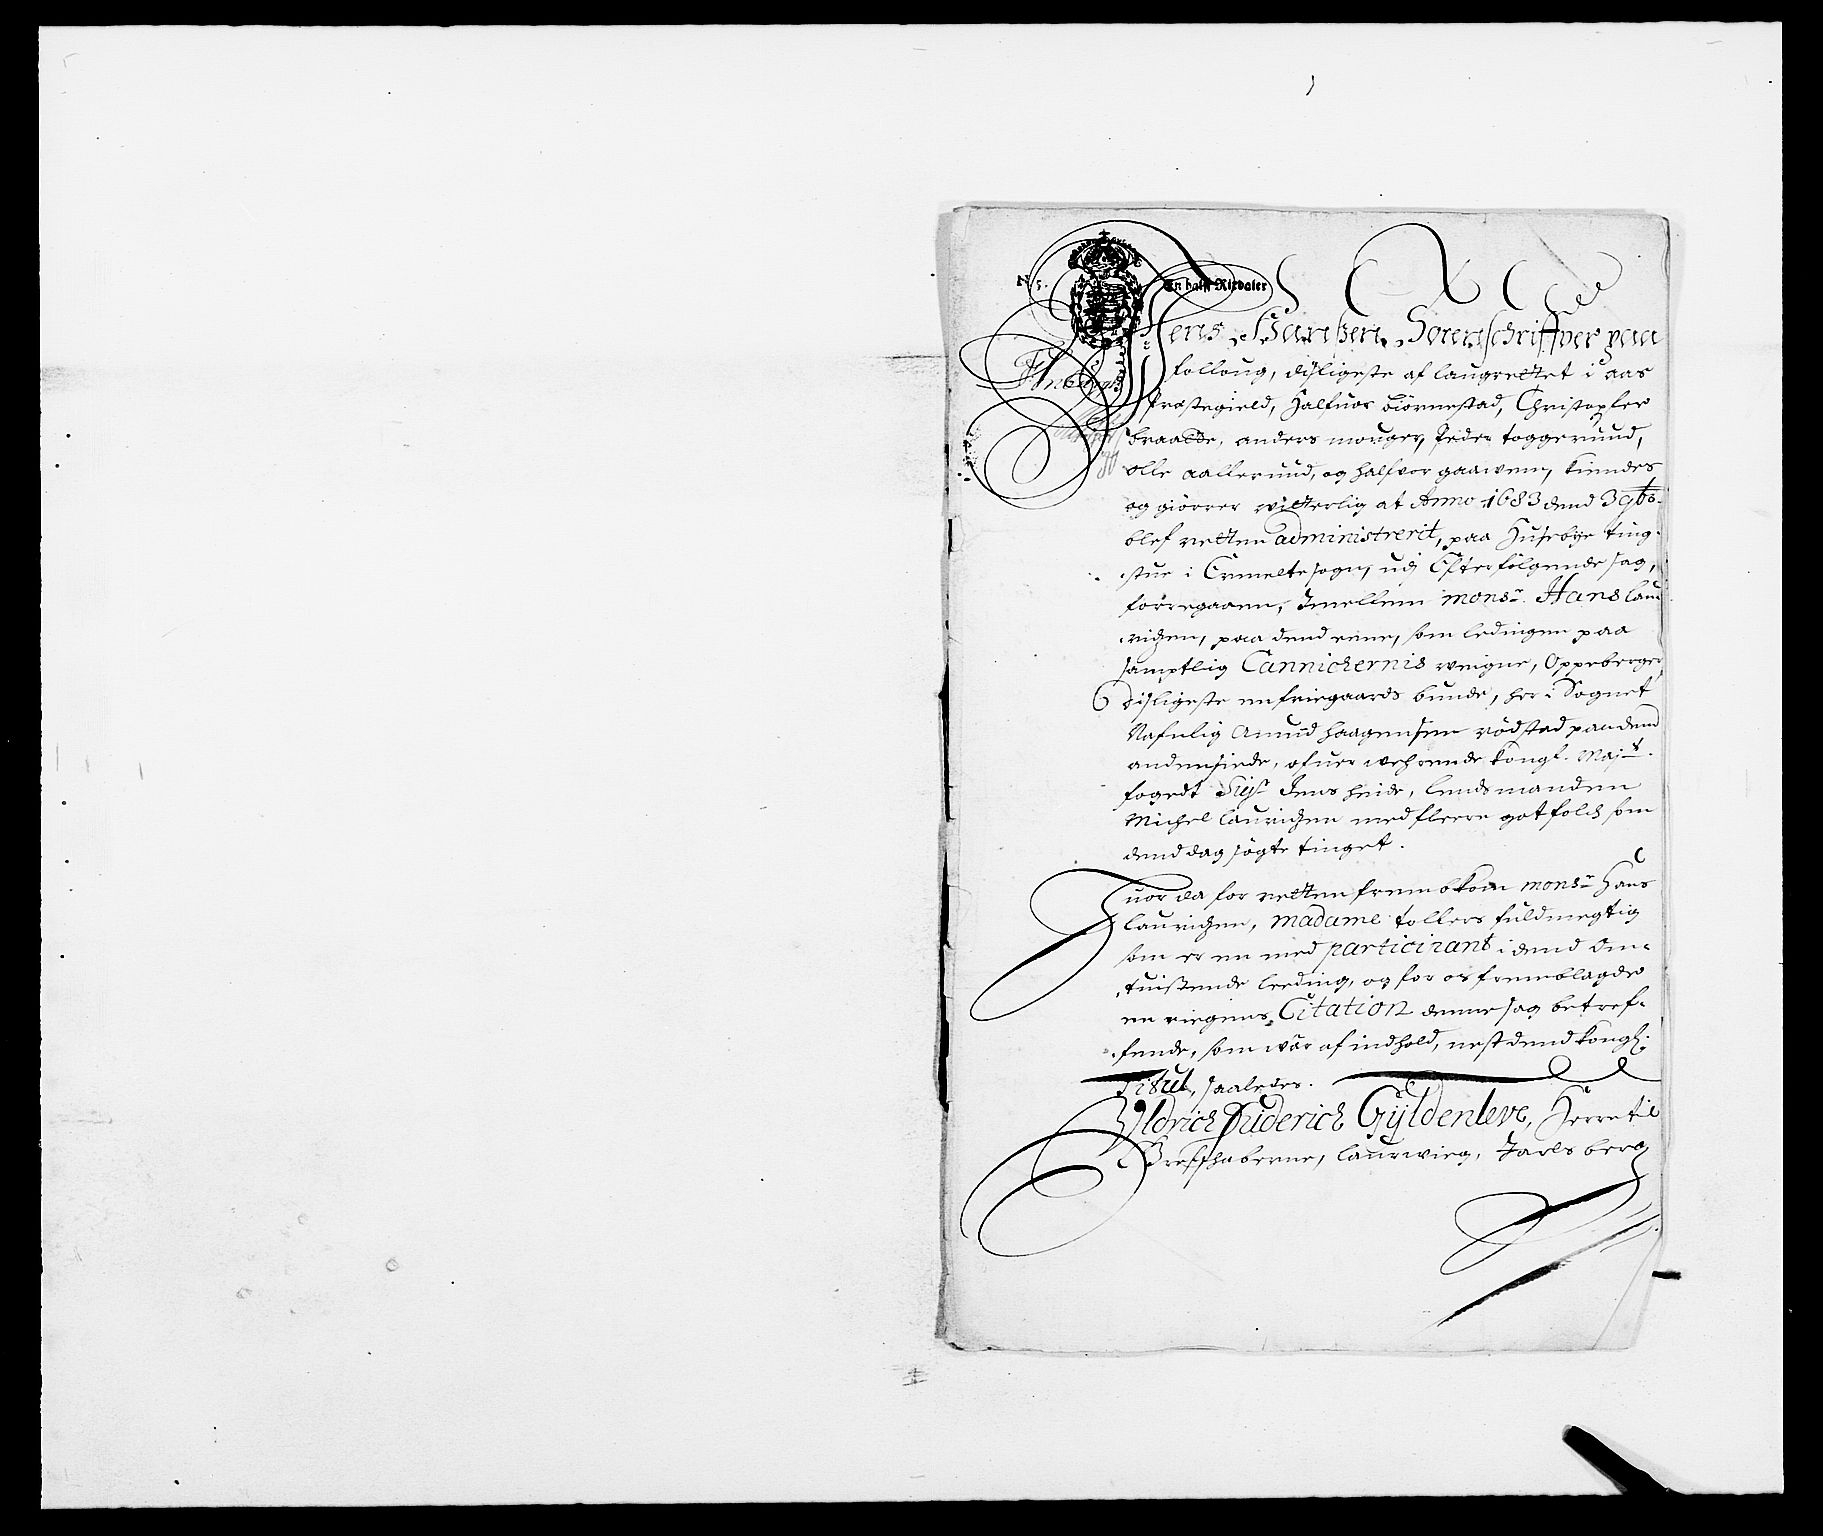 RA, Rentekammeret inntil 1814, Reviderte regnskaper, Fogderegnskap, R09/L0430: Fogderegnskap Follo, 1682-1683, s. 245